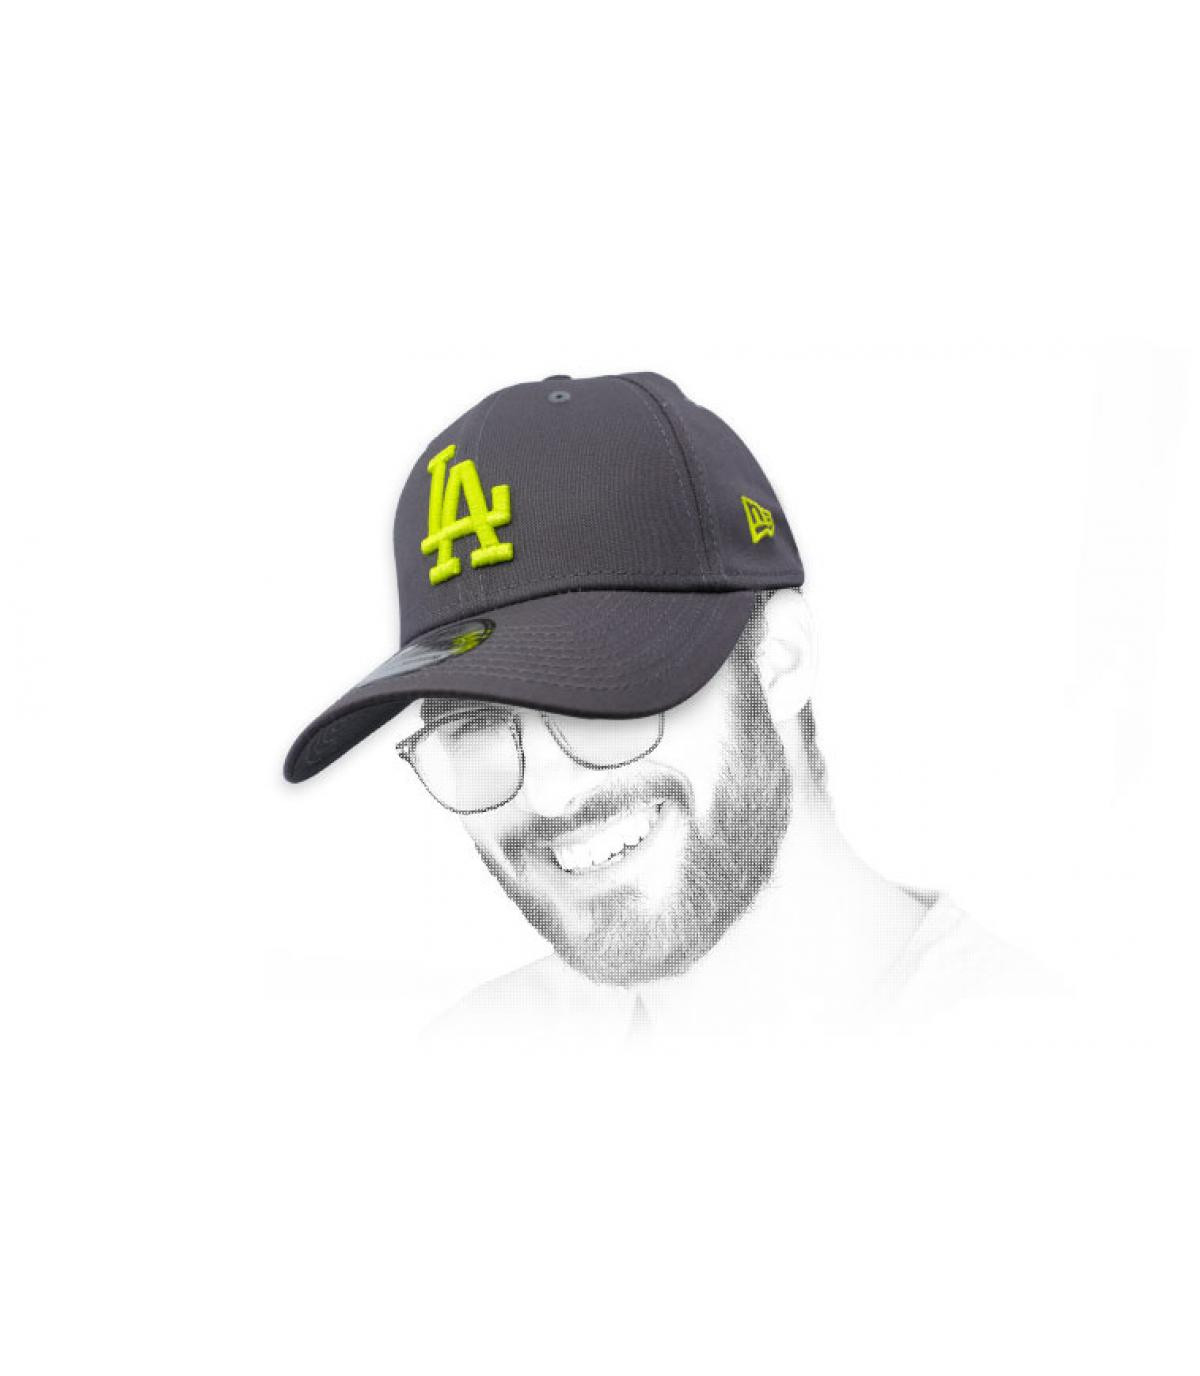 kap LA grijs geel